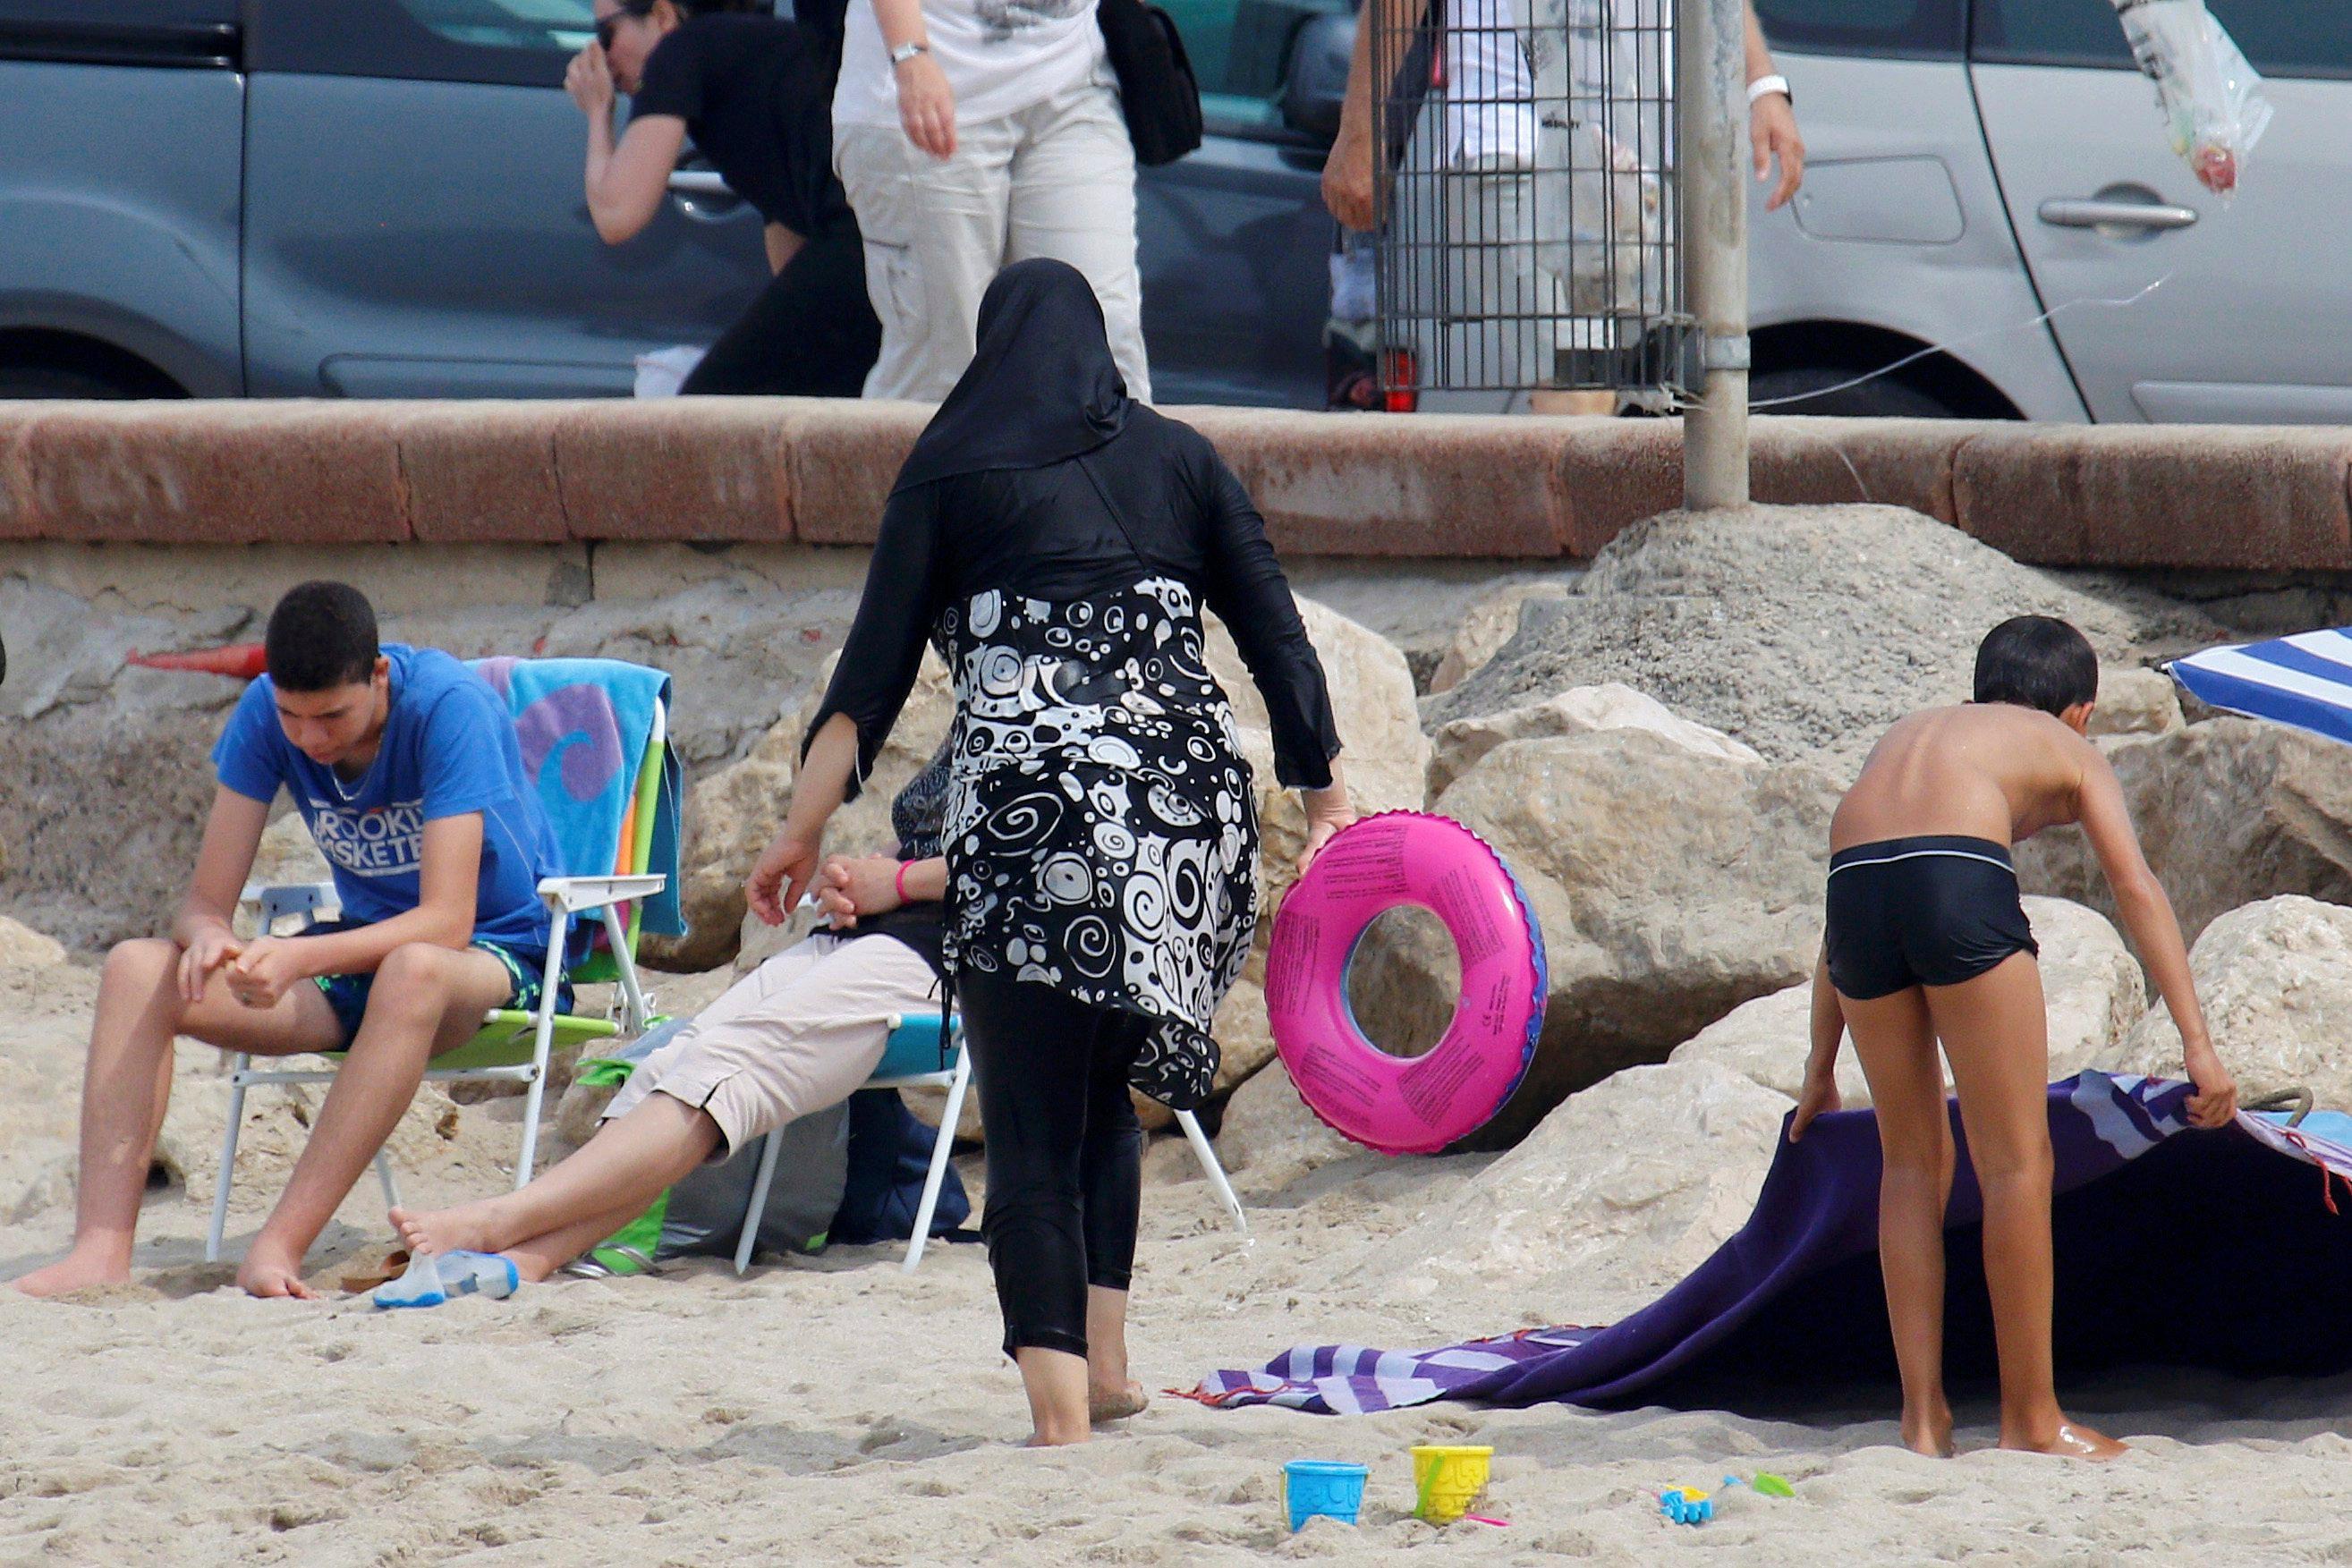 Troubled Europe debates burqas, niqabs and Burkinis